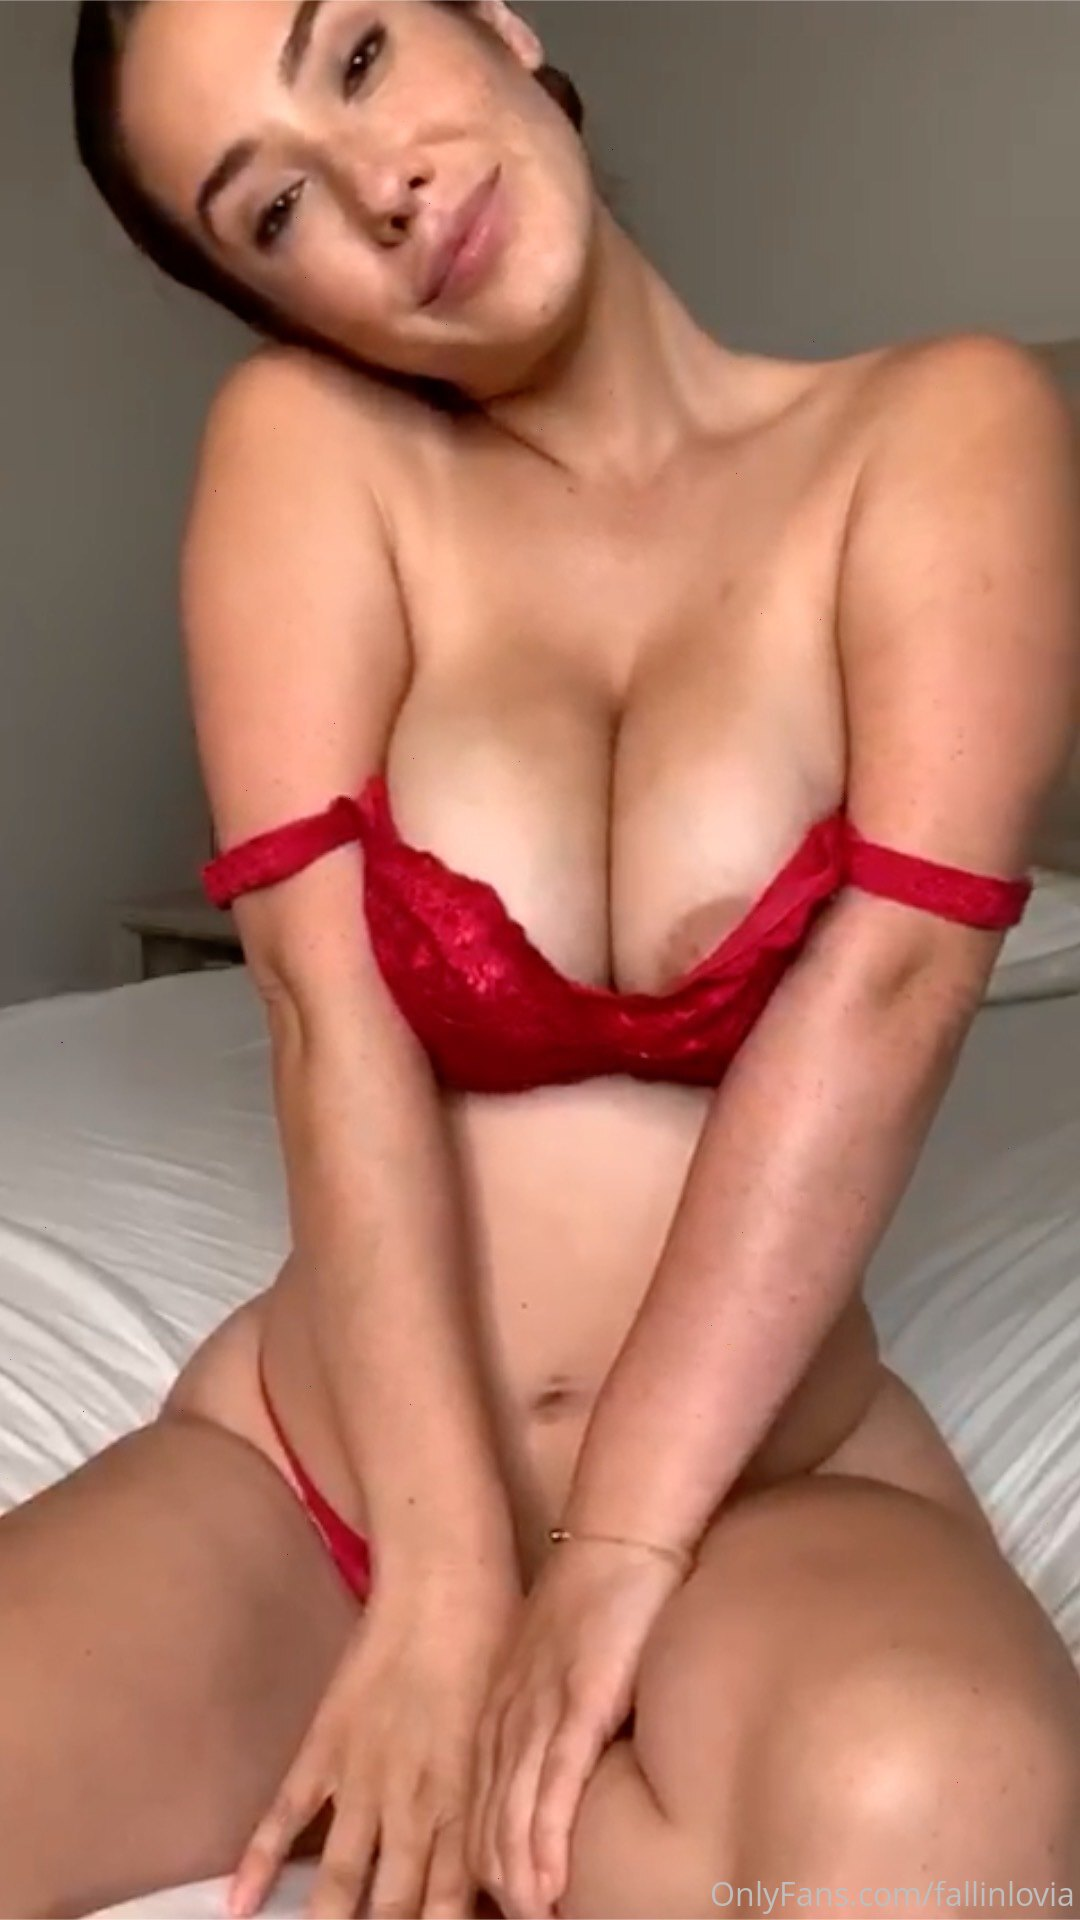 Eva Lovia, Fallinlovia, Onlyfans 0070